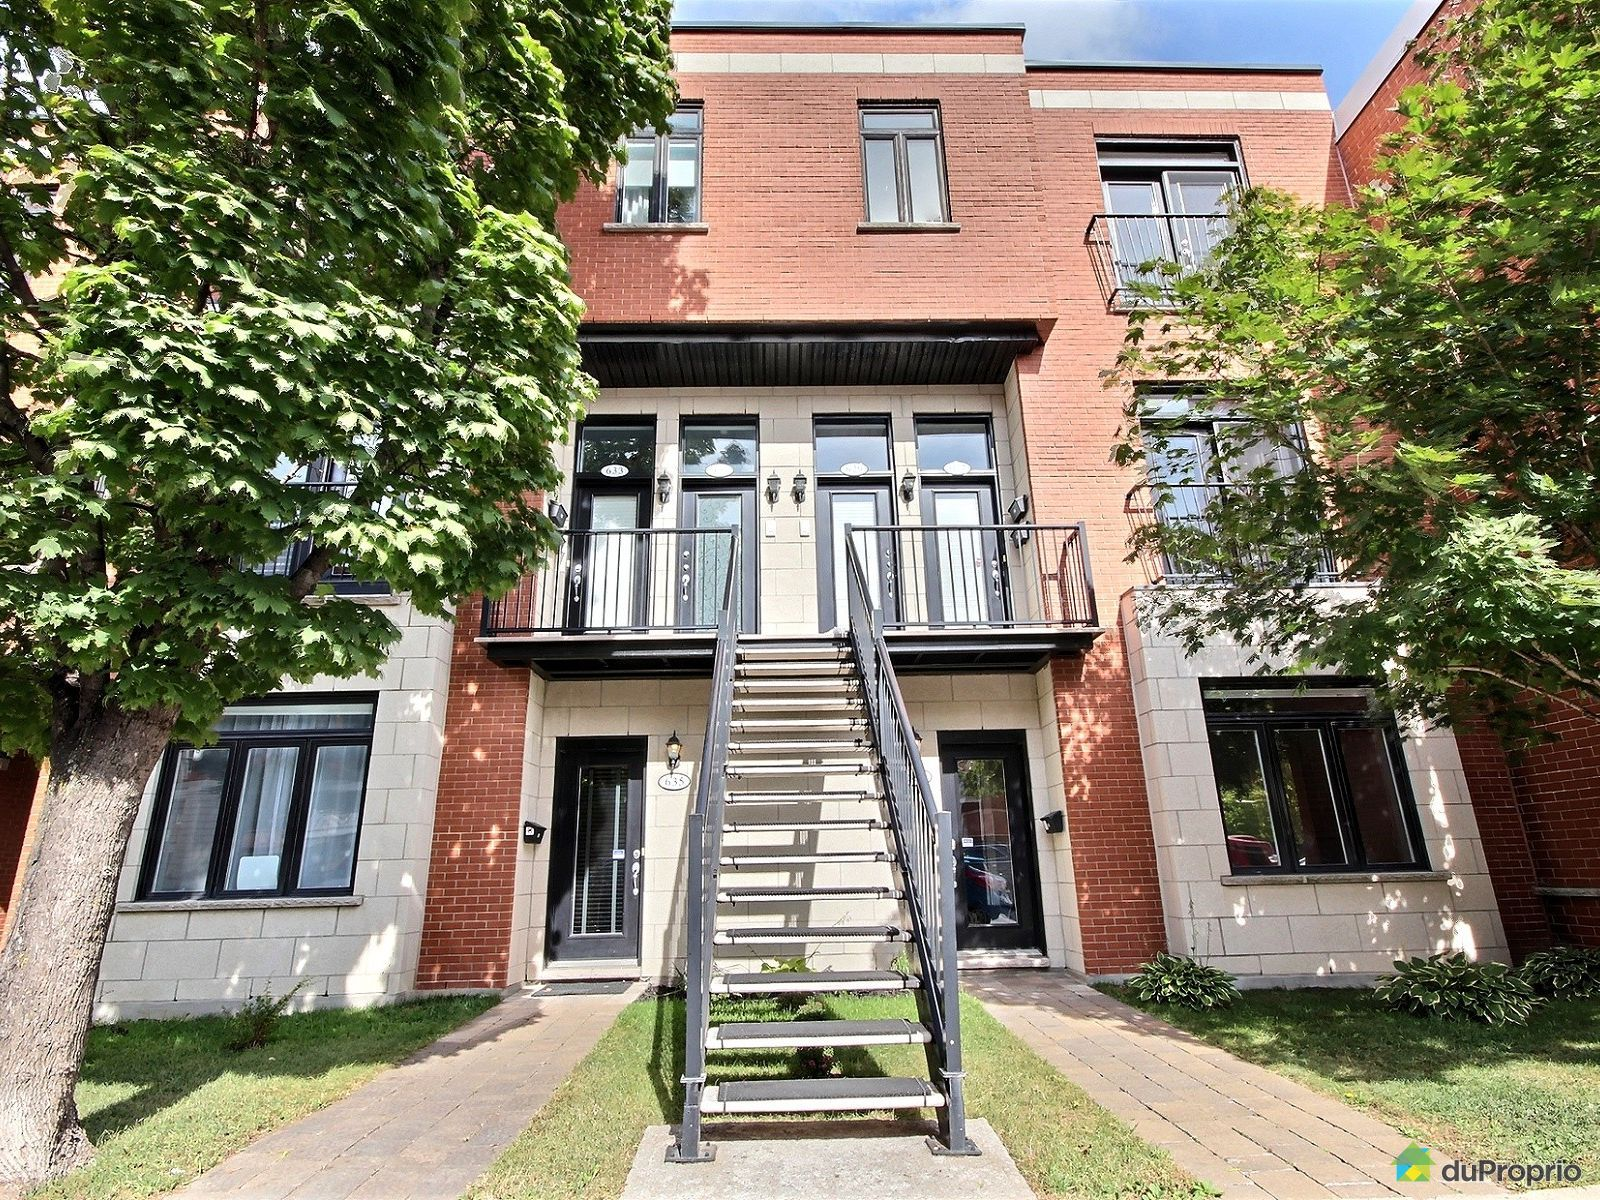 625 rue de lglise Verdun for sale DuProprio